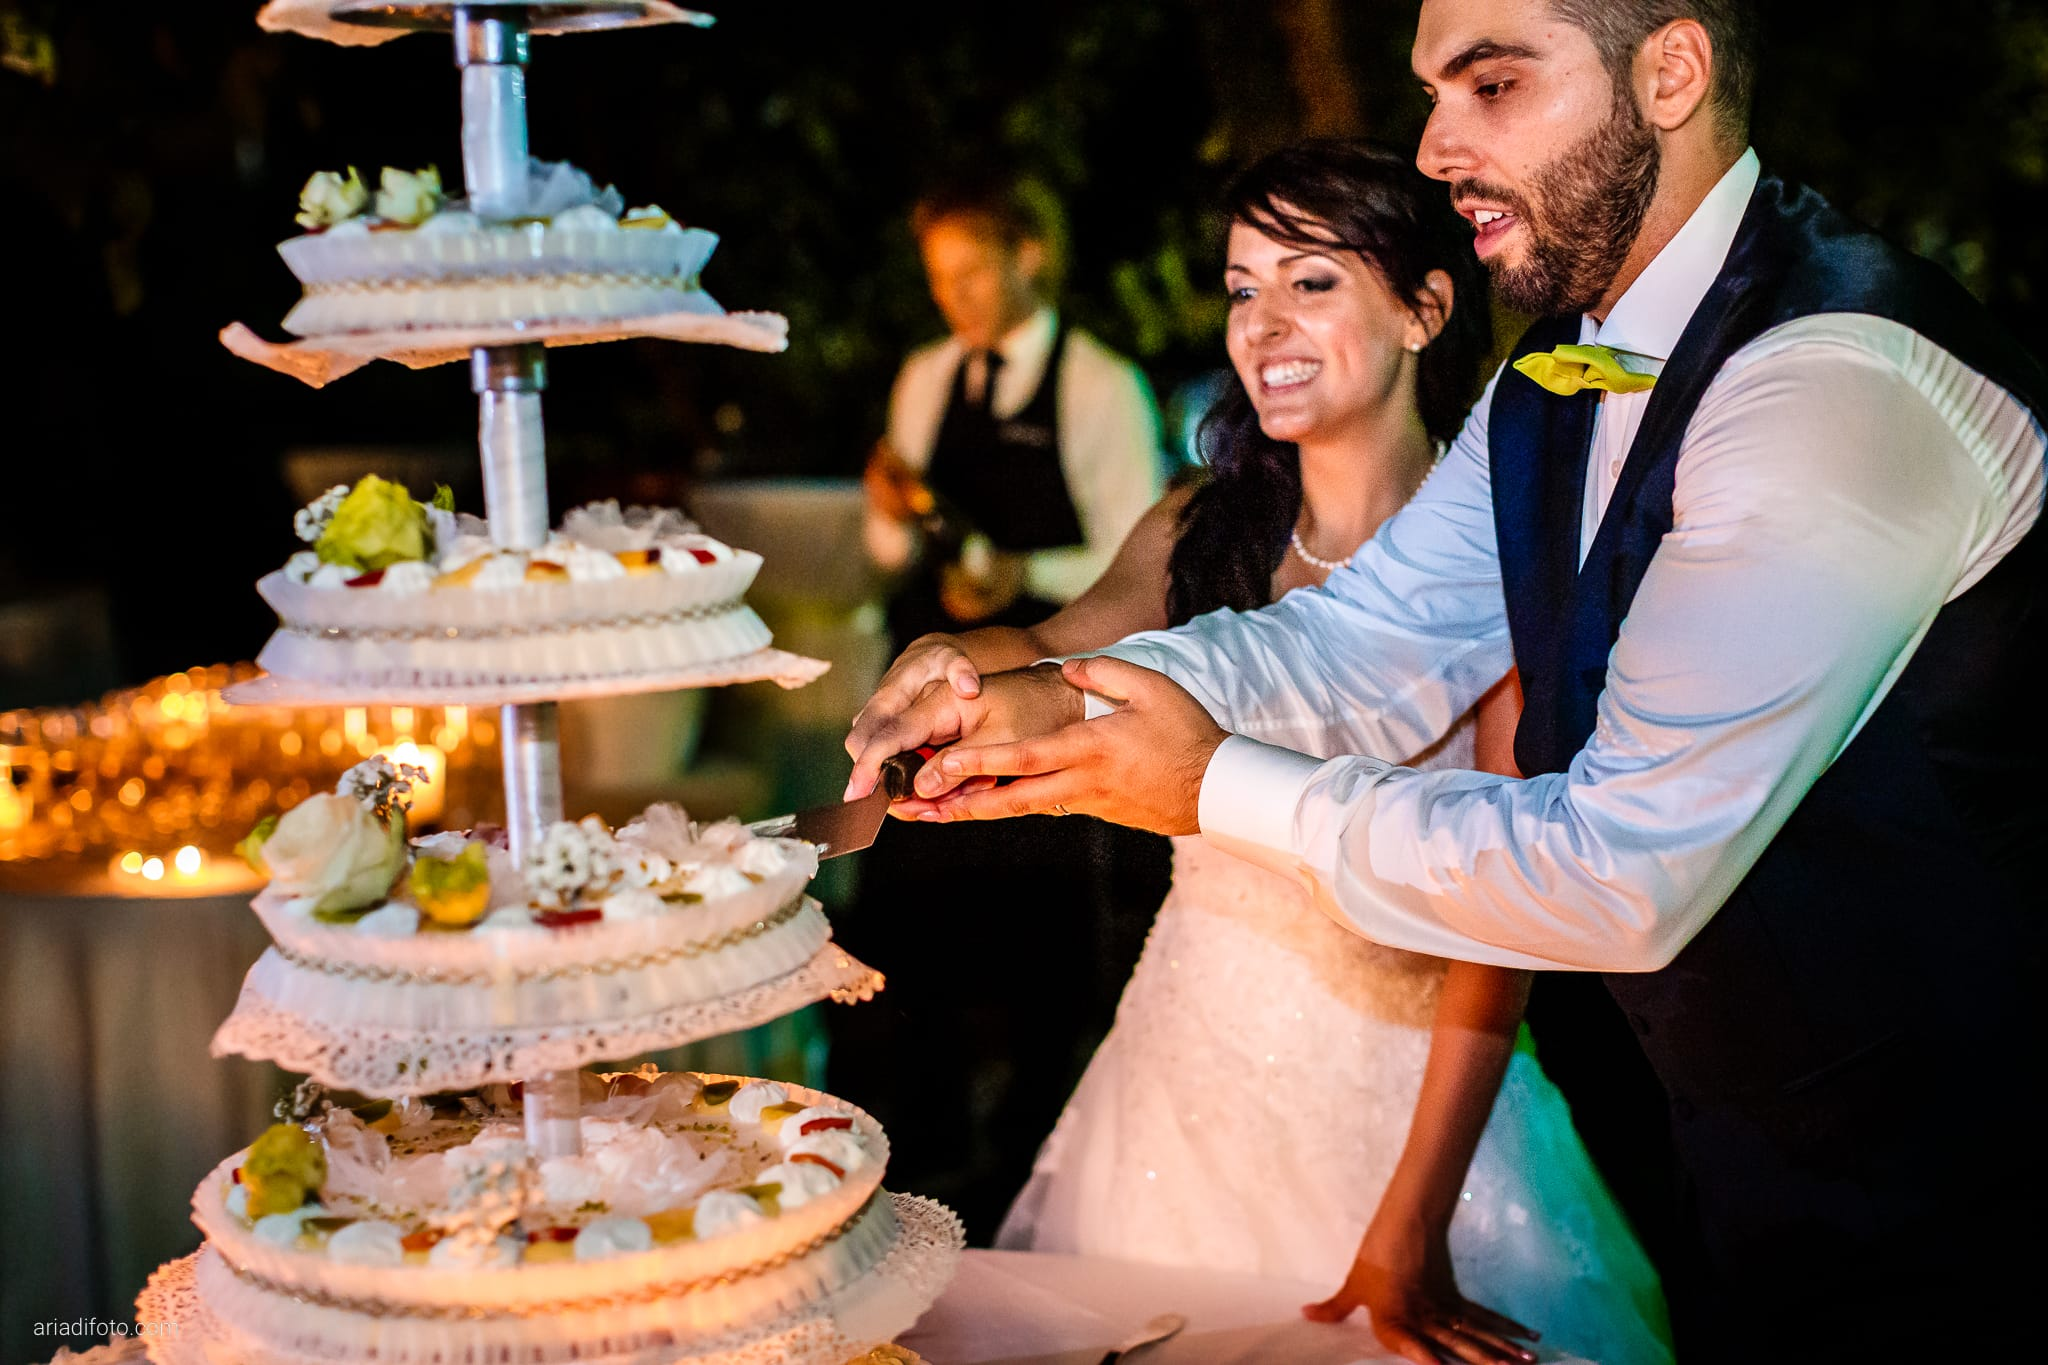 Rosylenia Luca Matrimonio Duino Ristorante Napoleone Castions Udine ricevimento torta